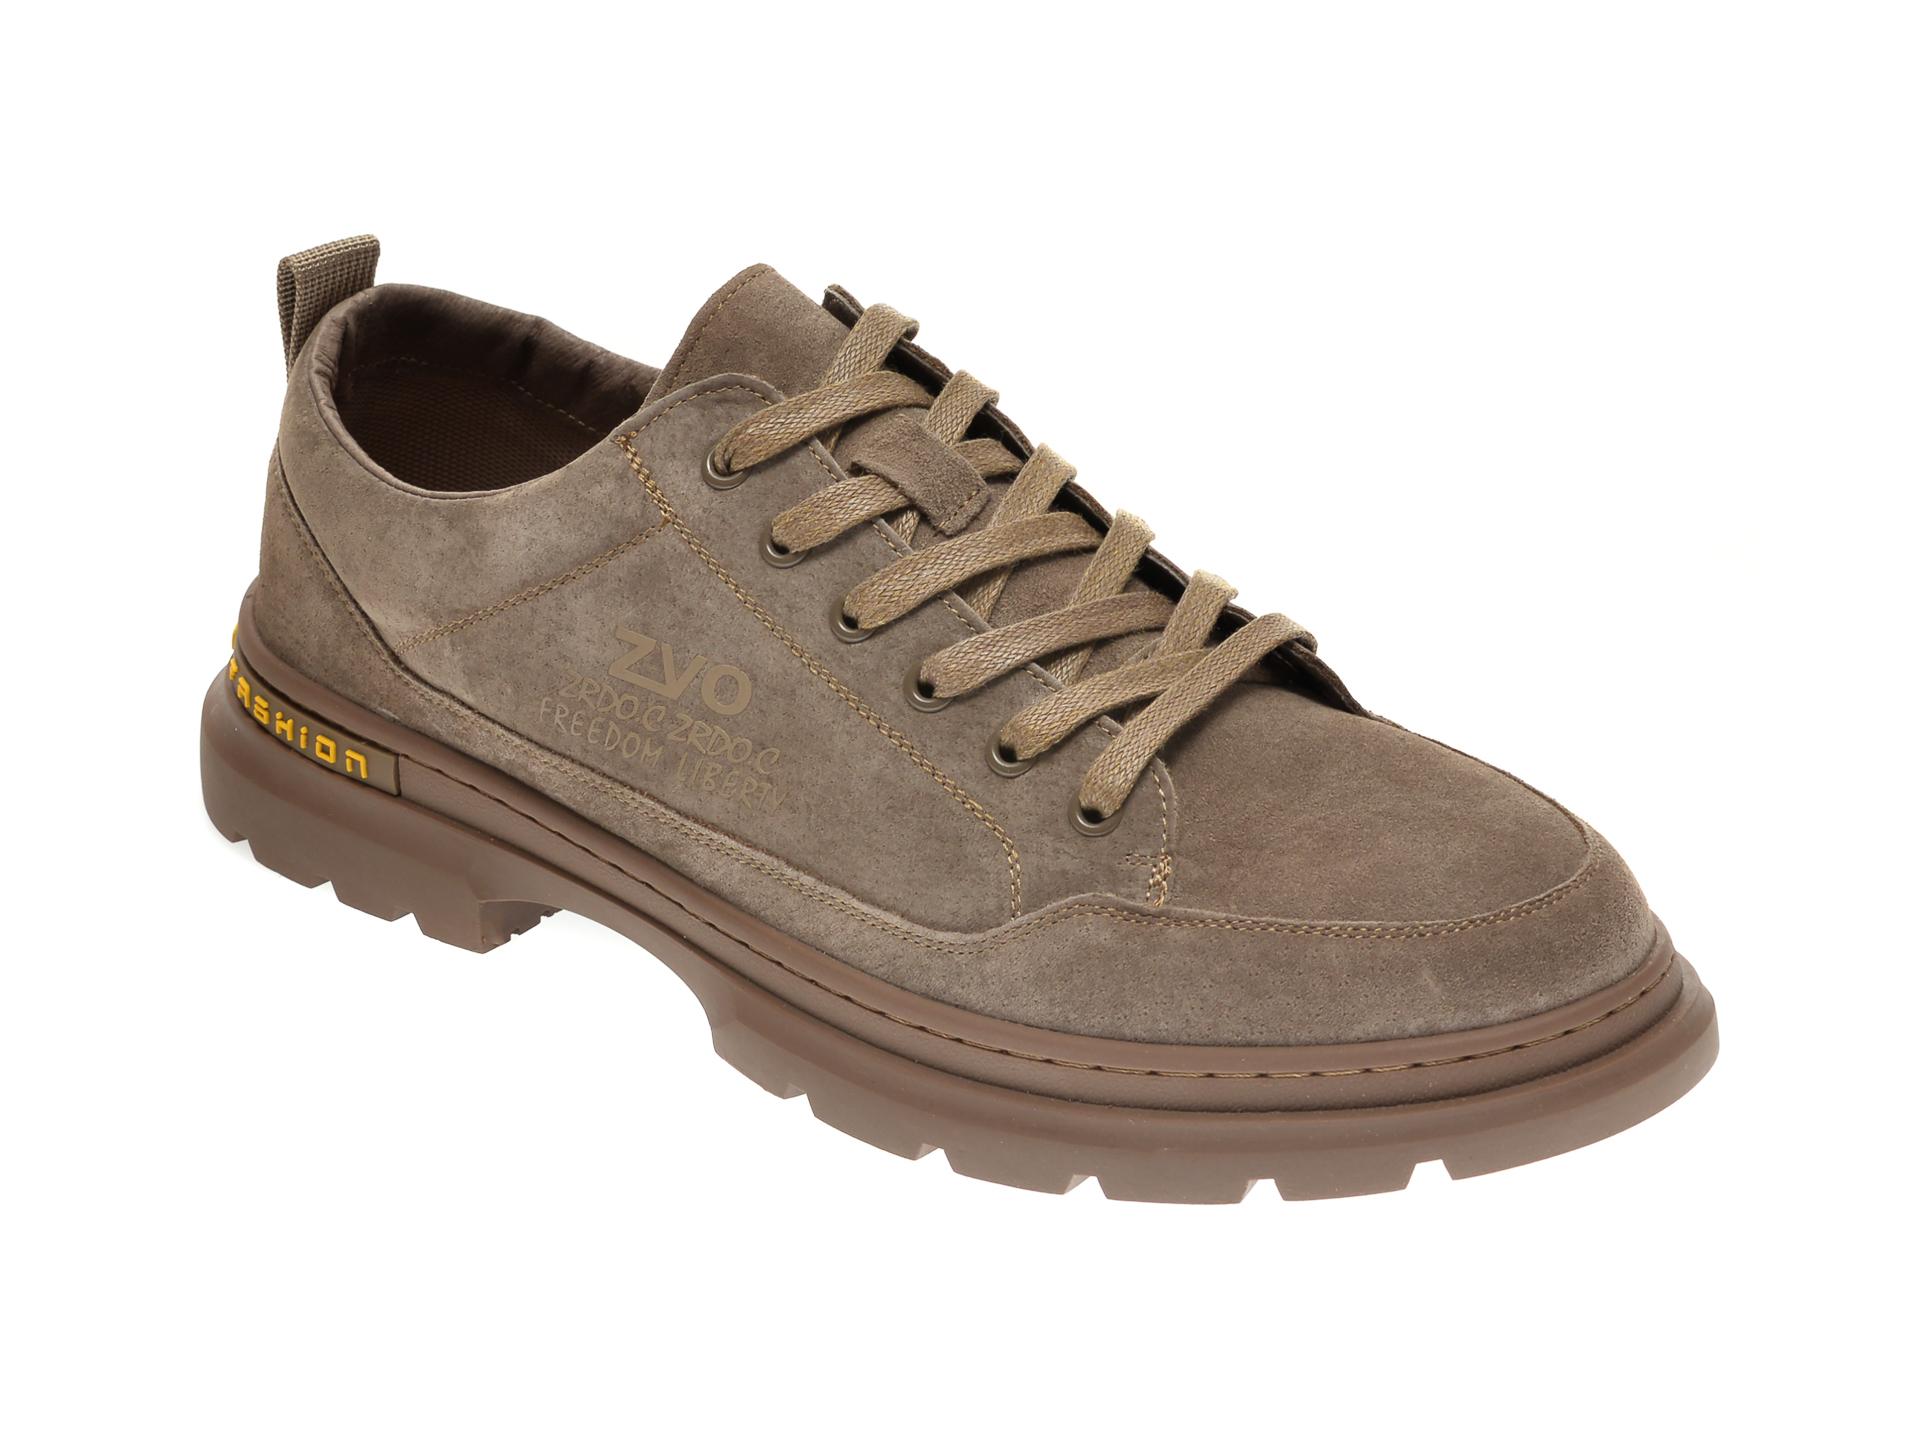 Pantofi Gryxx Maro, 81159, Din Nabuc